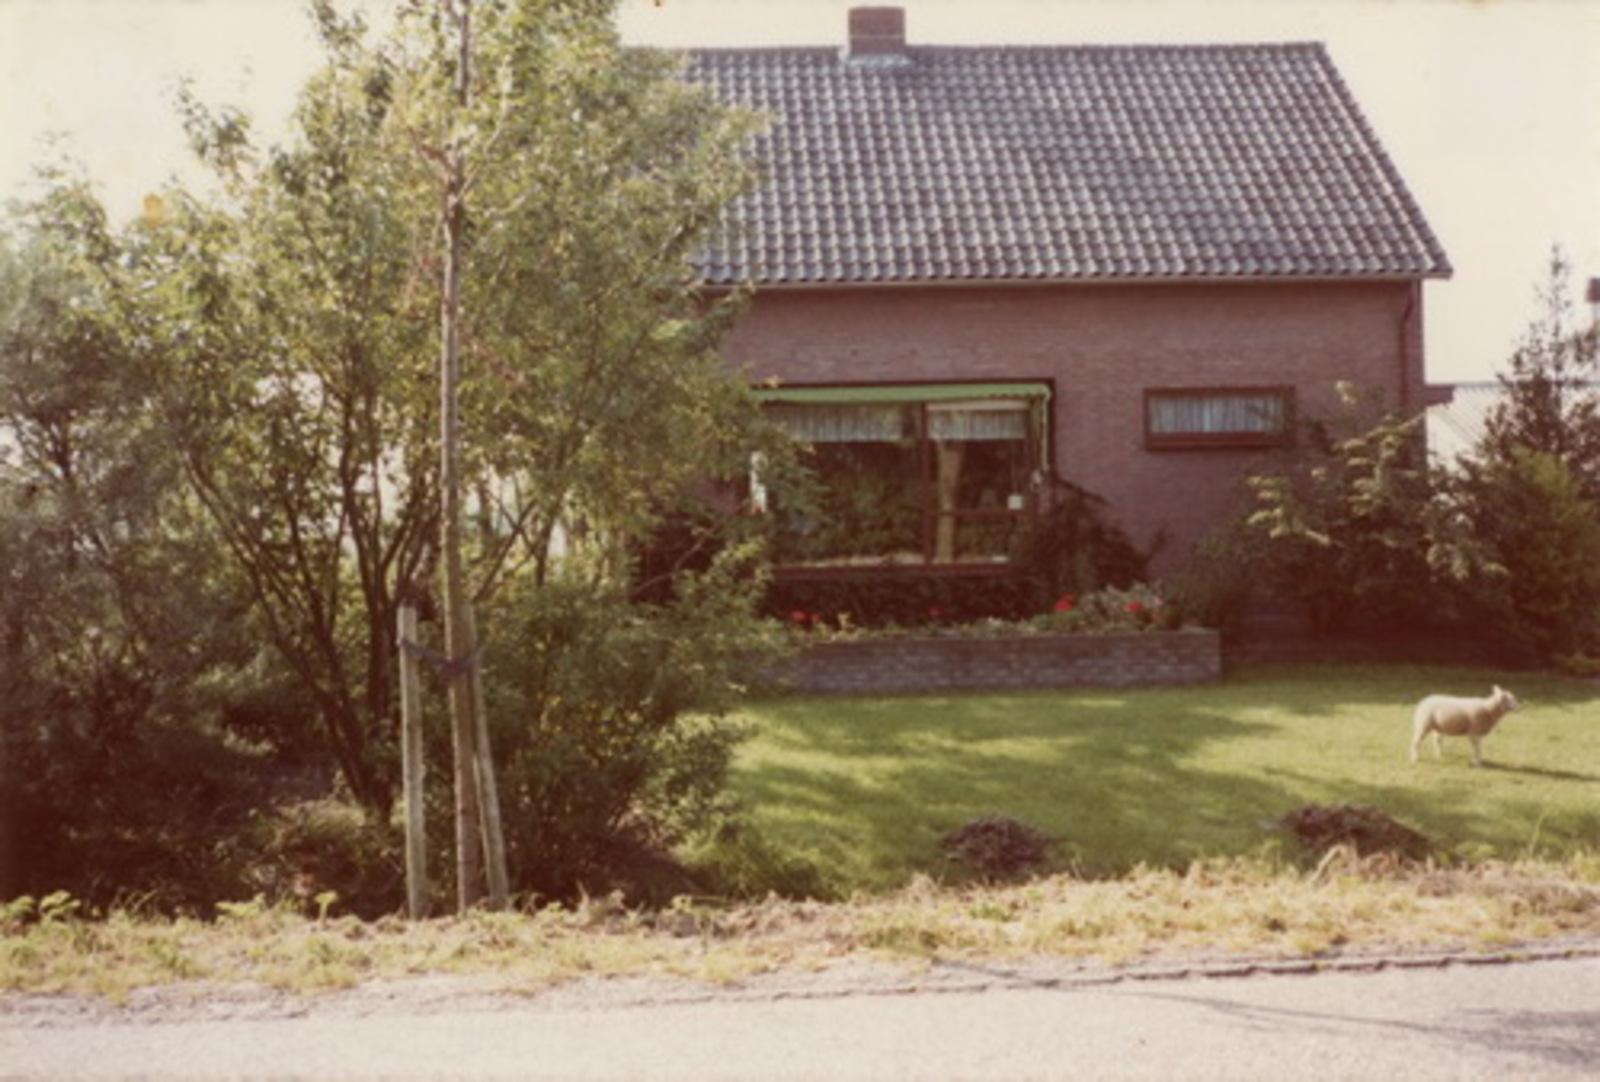 Spieringweg Onbekend 1983 huize fam Volwater